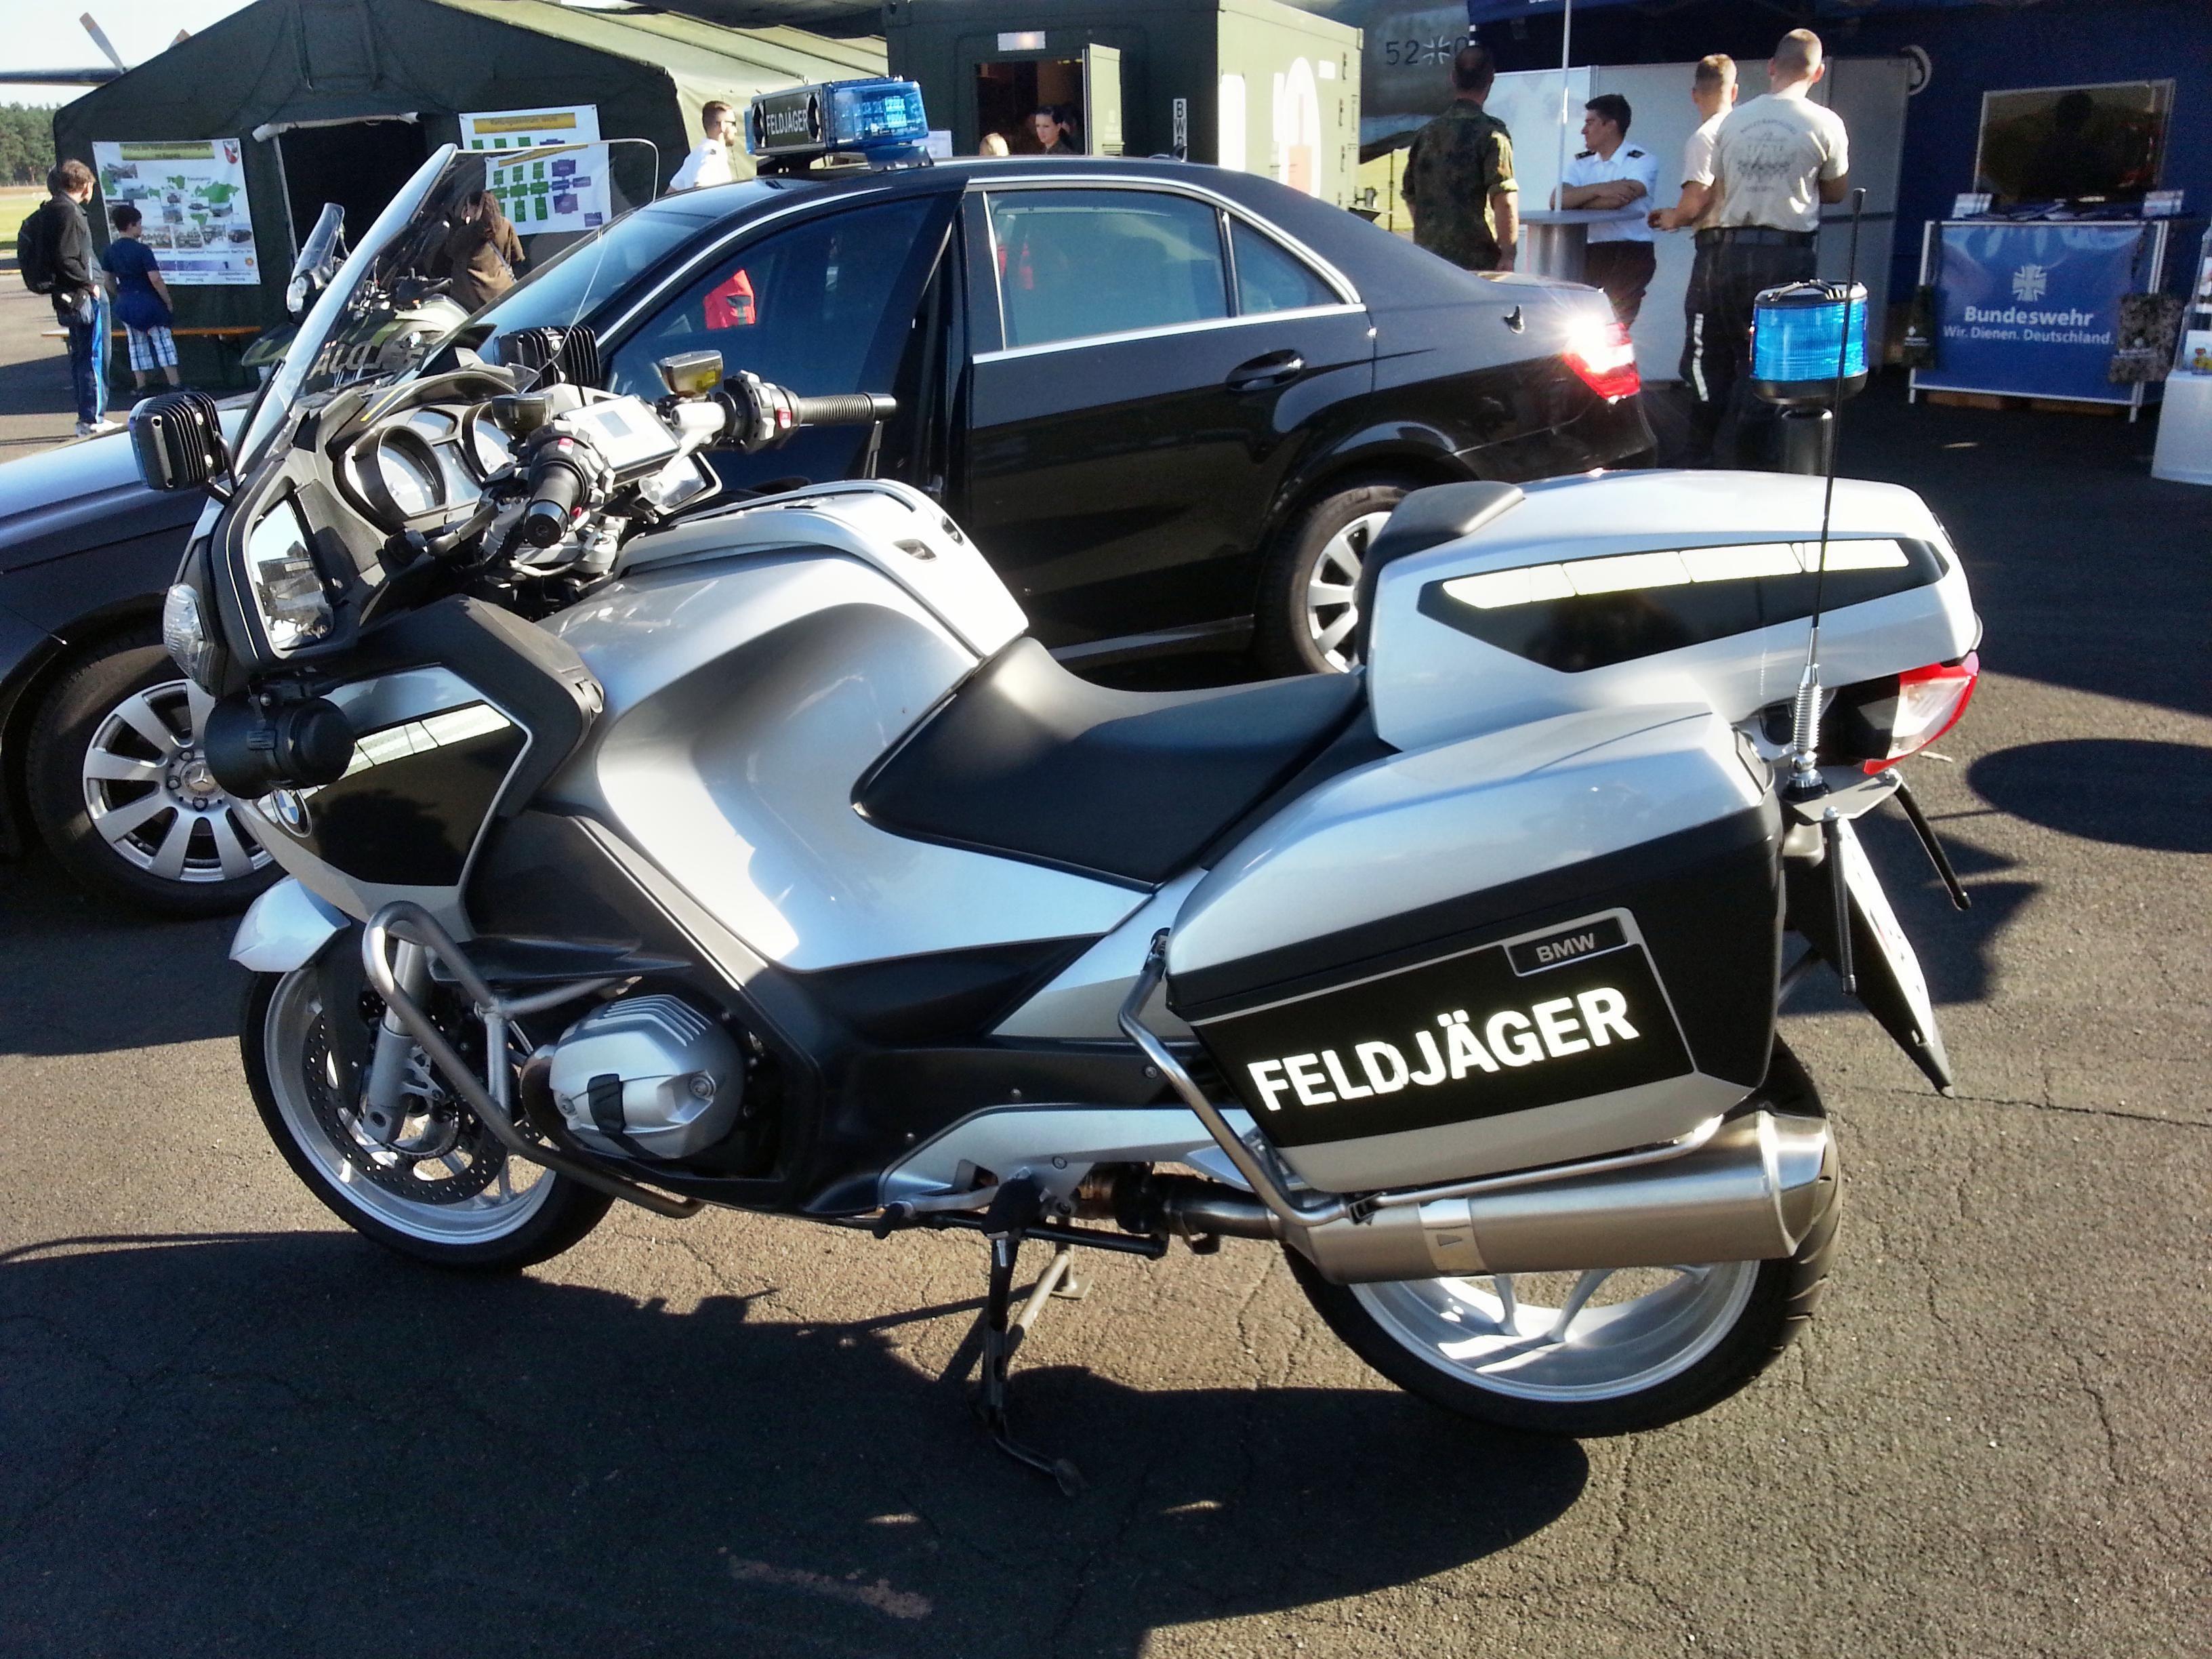 german military police motorcycle | my cars & motorbikes